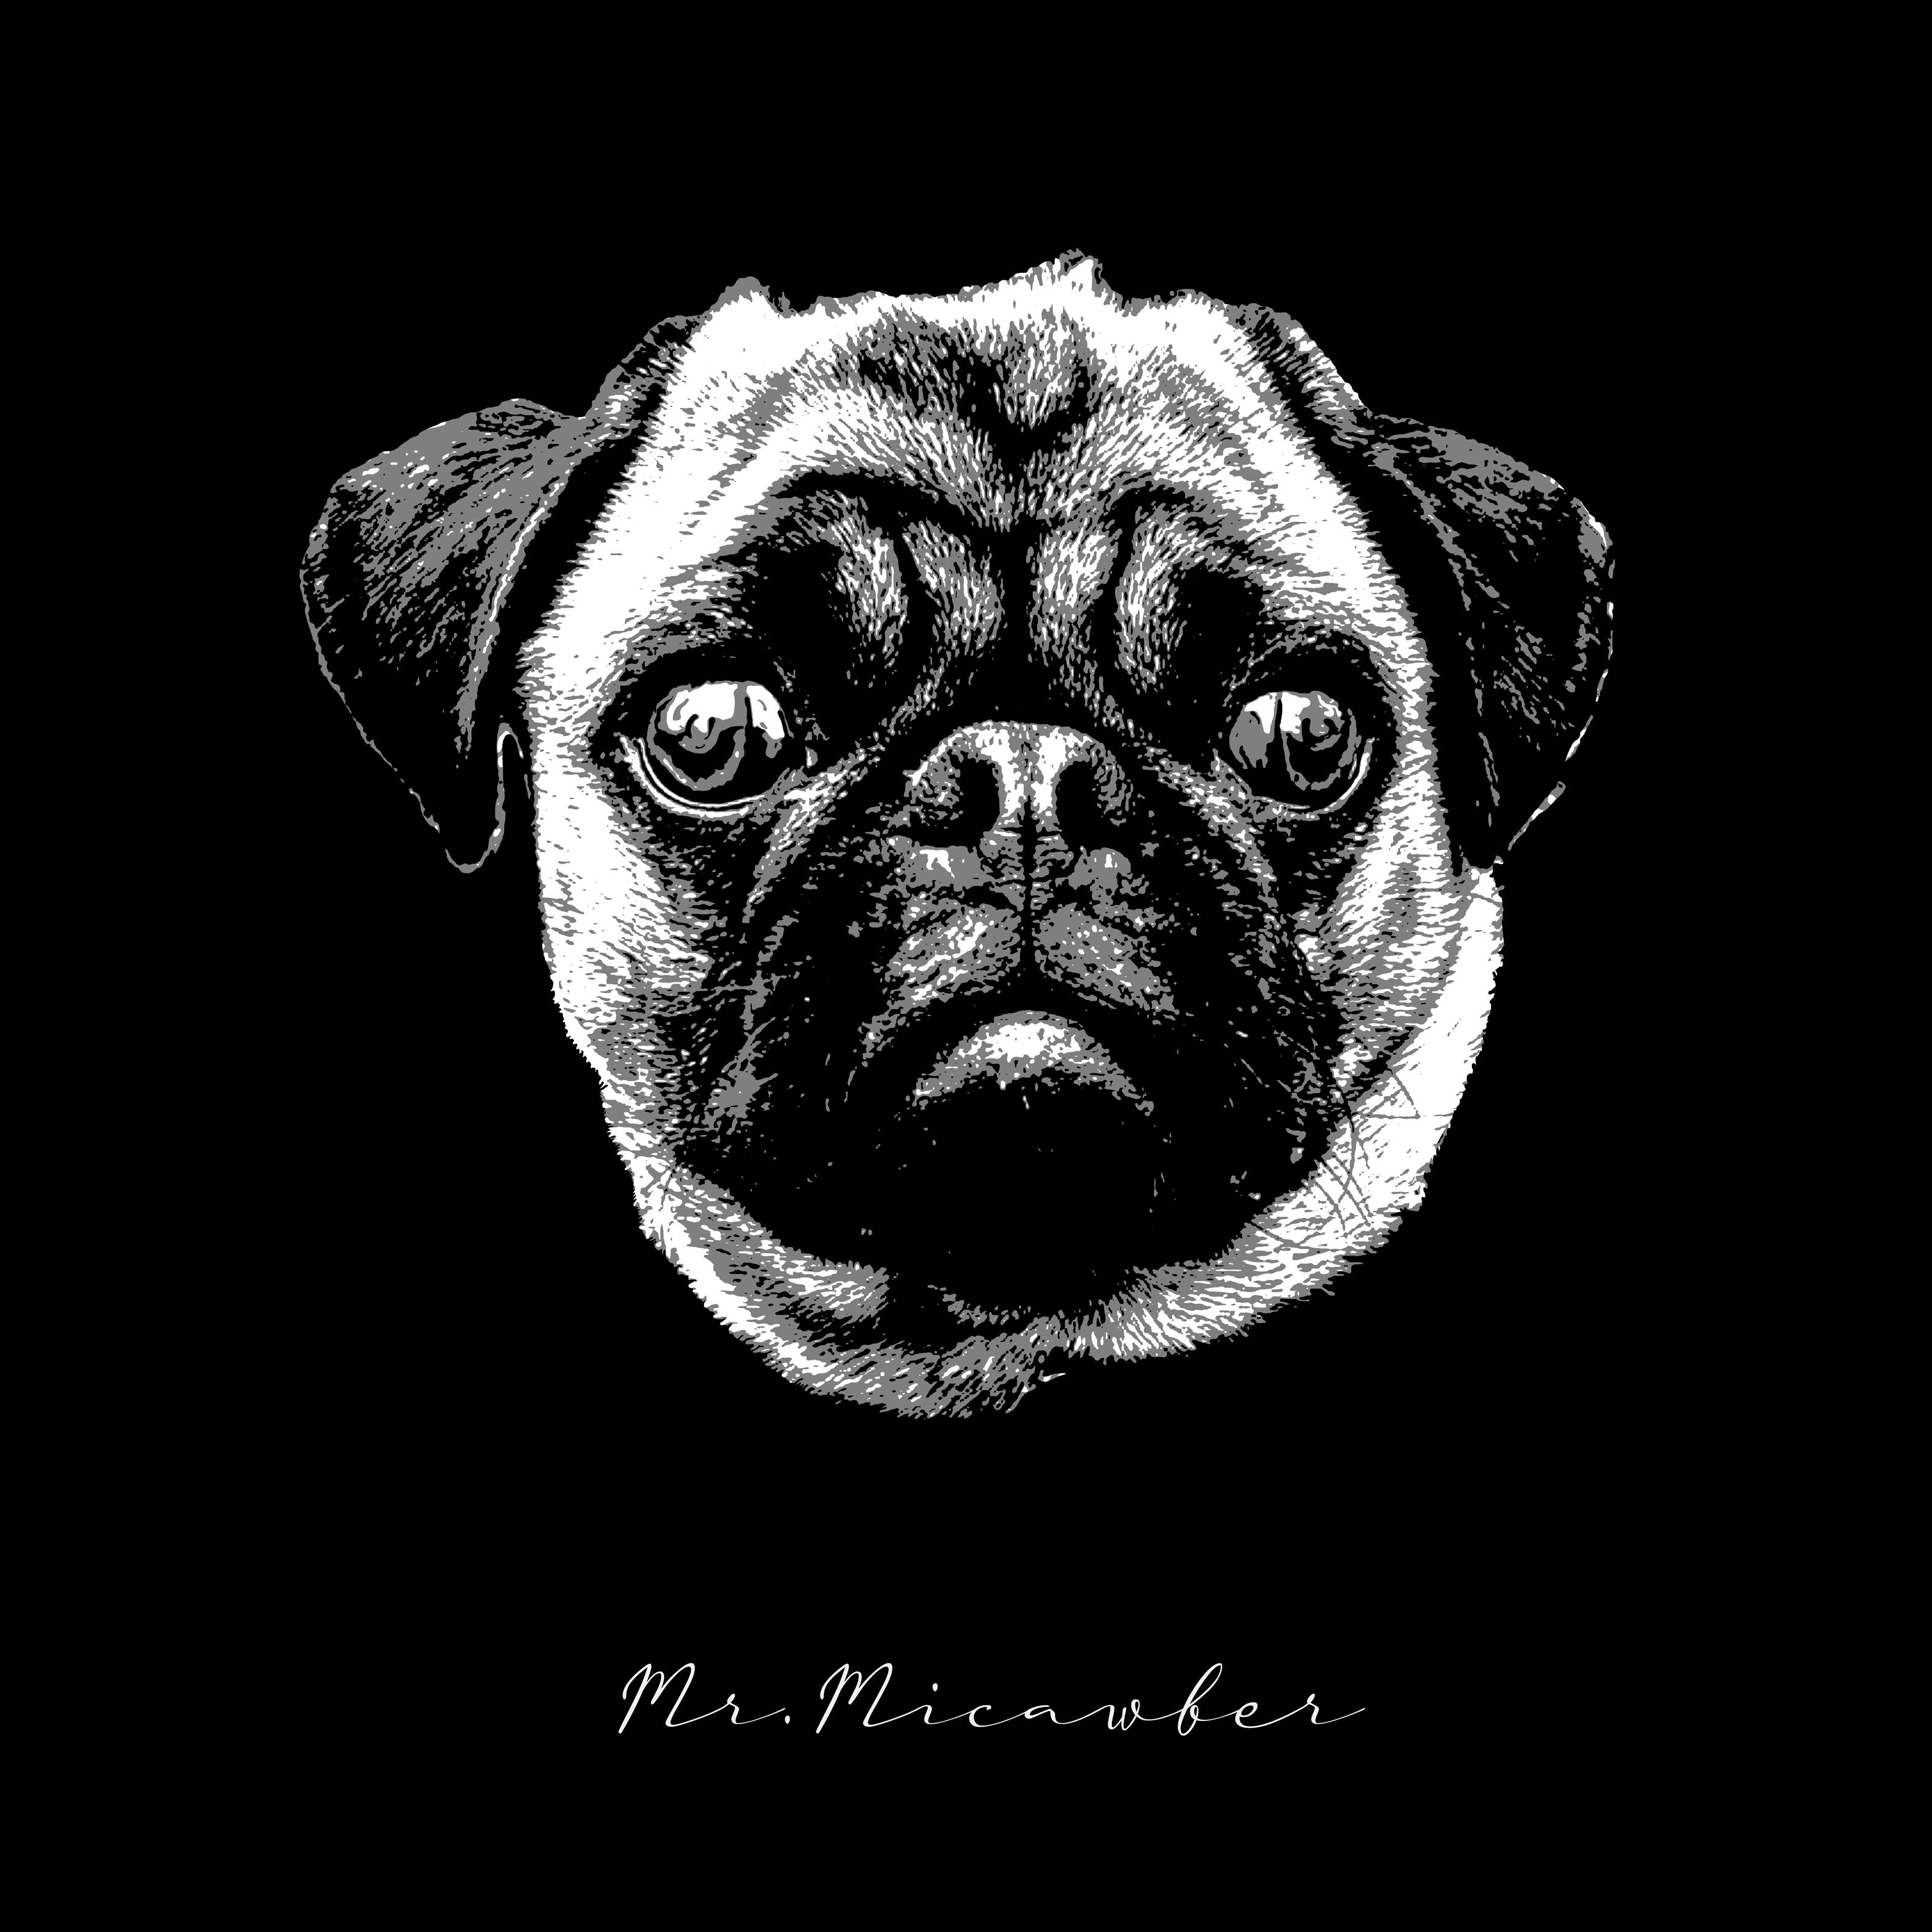 Pug head art with Signature Portrait effect added, Mr. Micawber Marbella